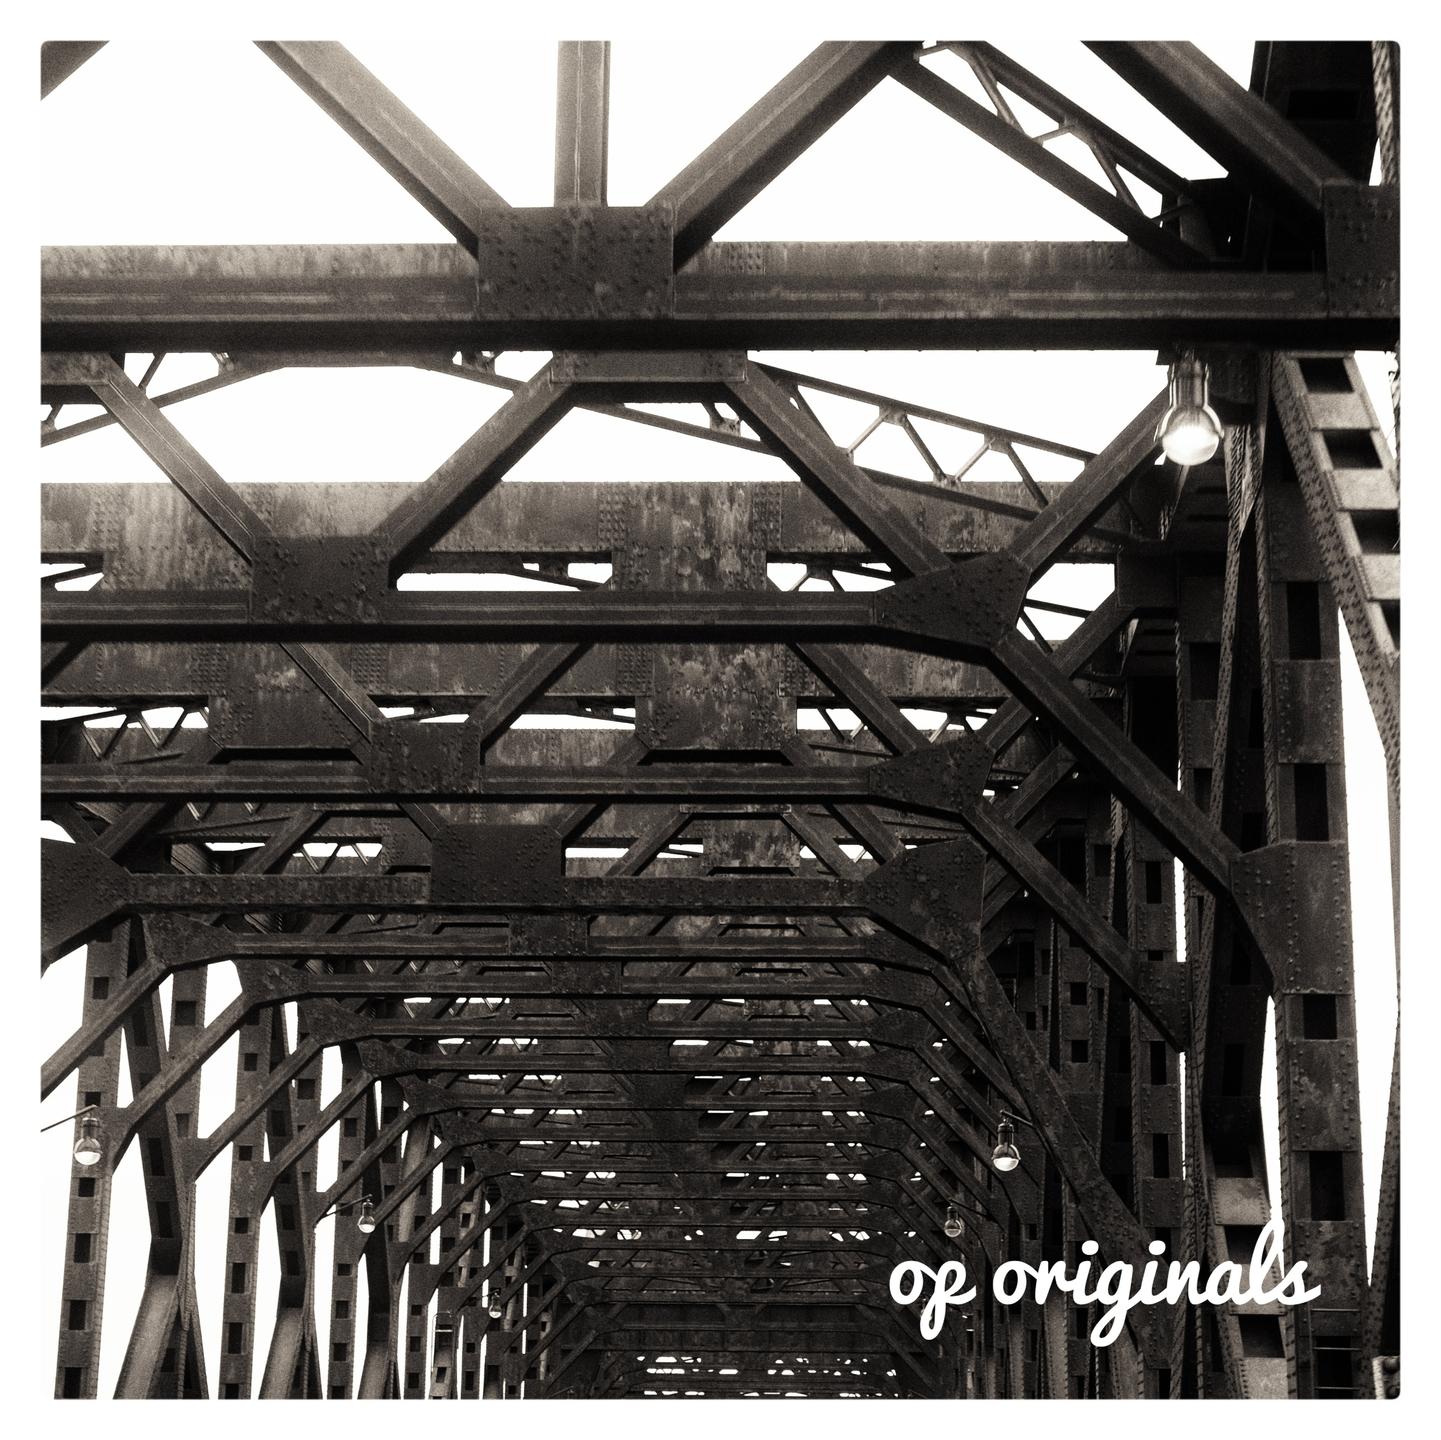 p originals (@oporiginals) Cover Image